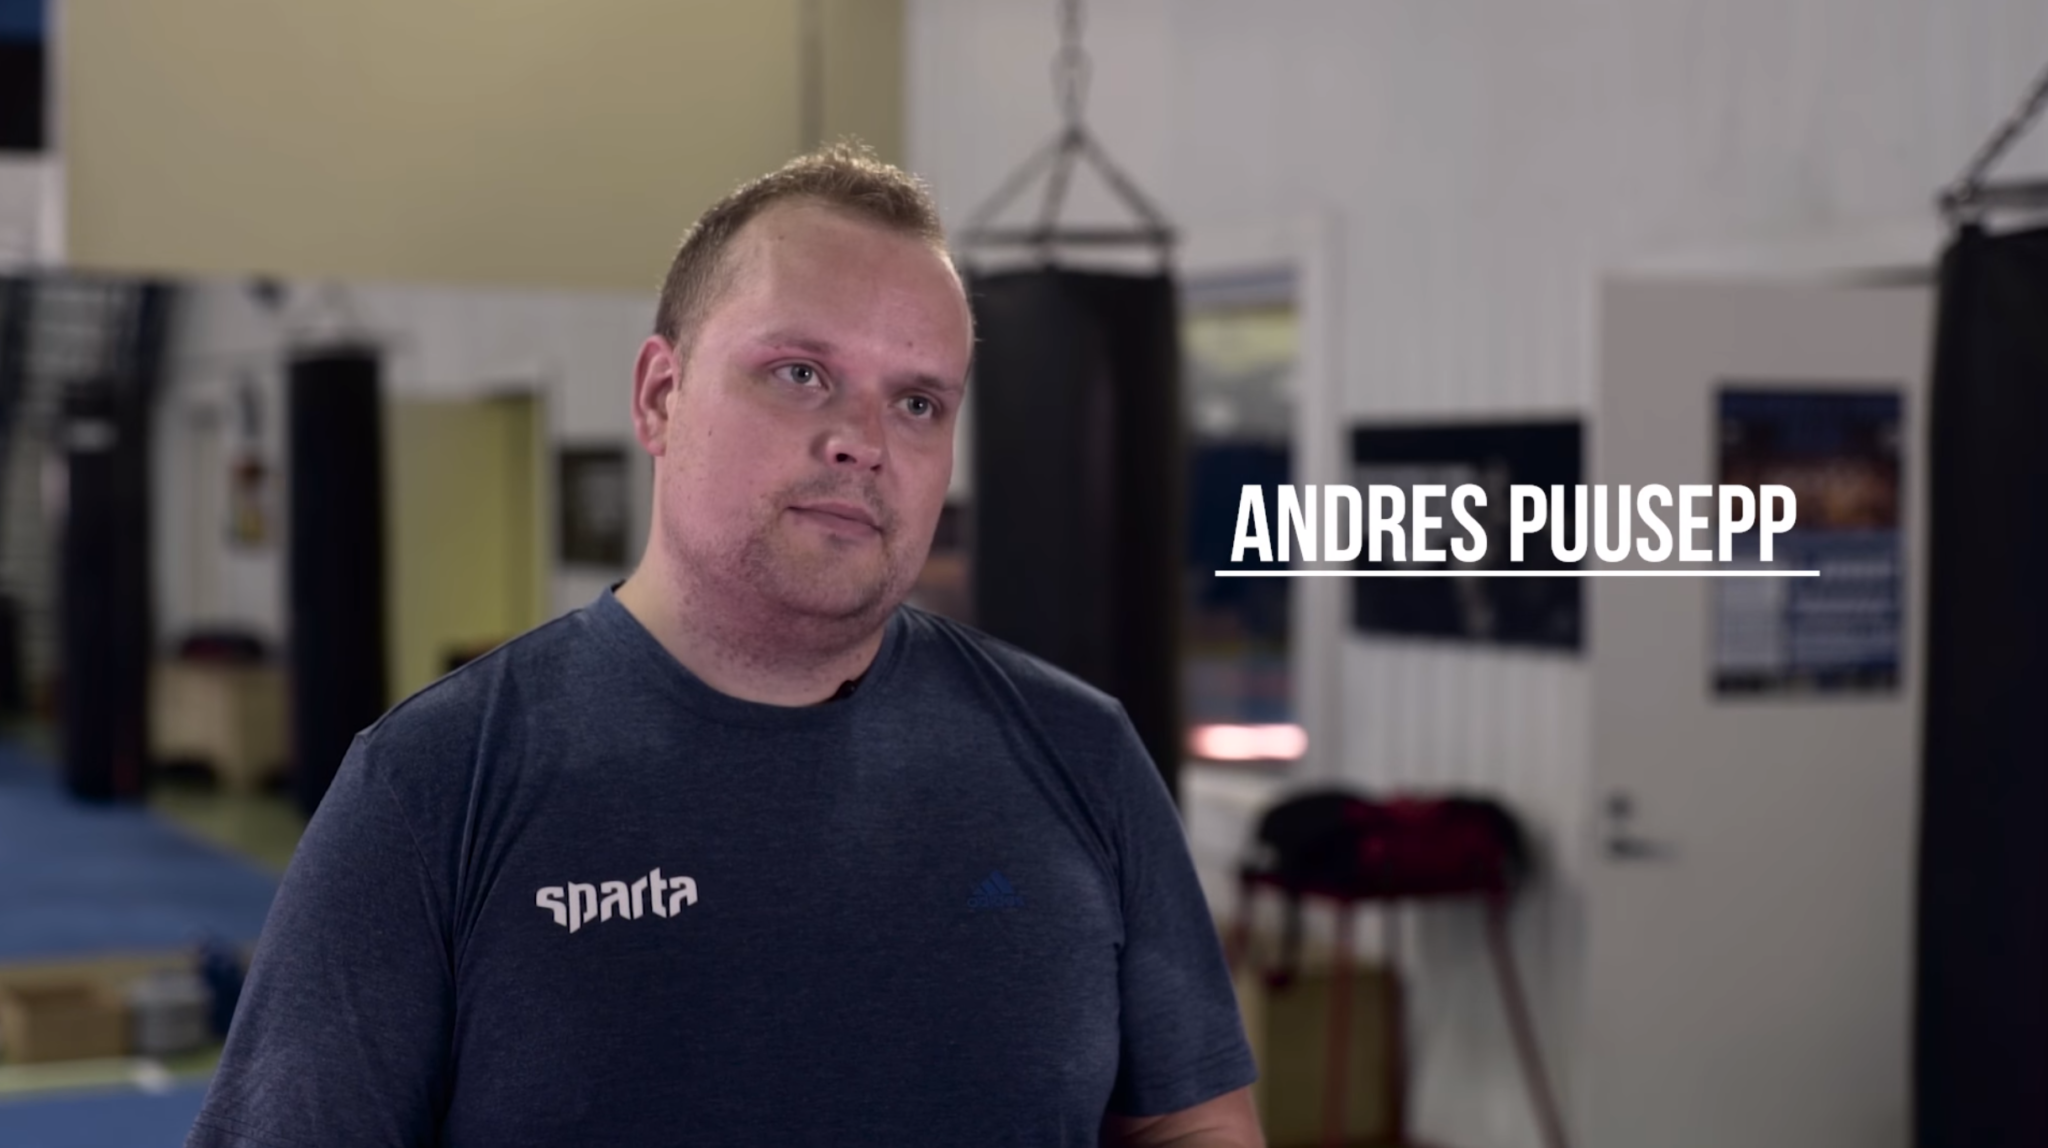 Andres Puusepp